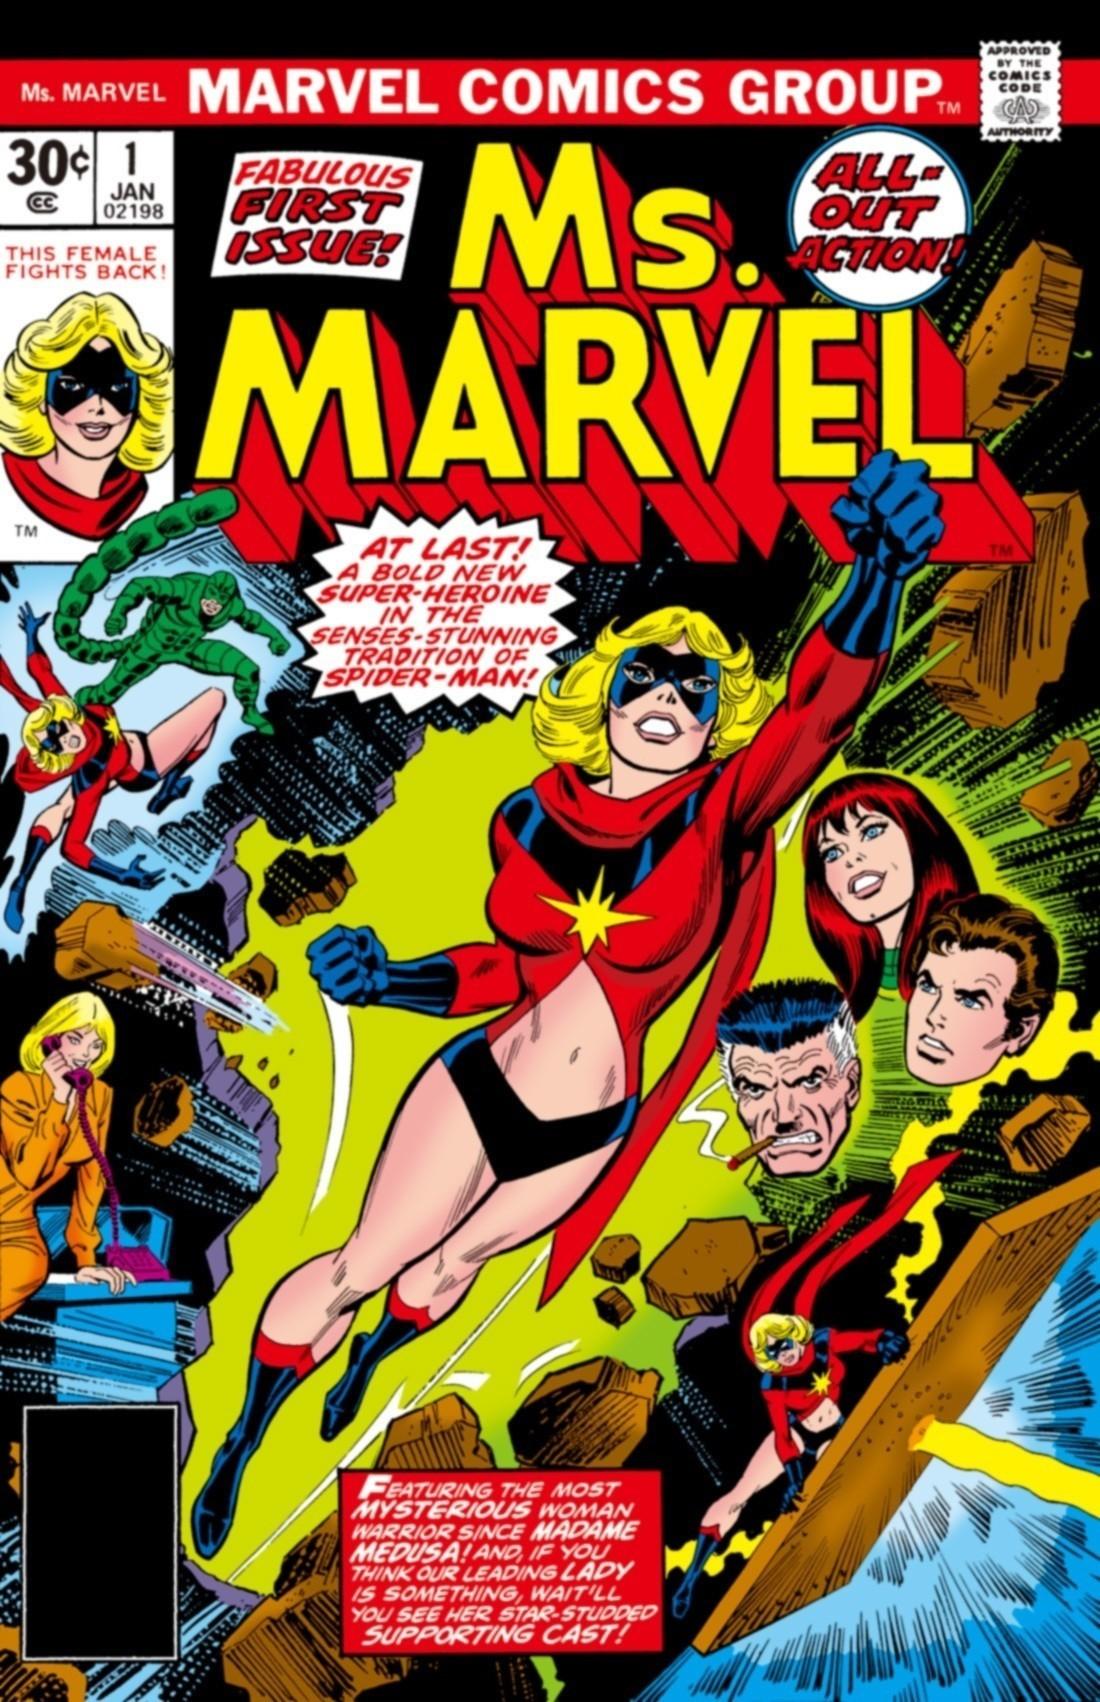 『Ms.Marvel』